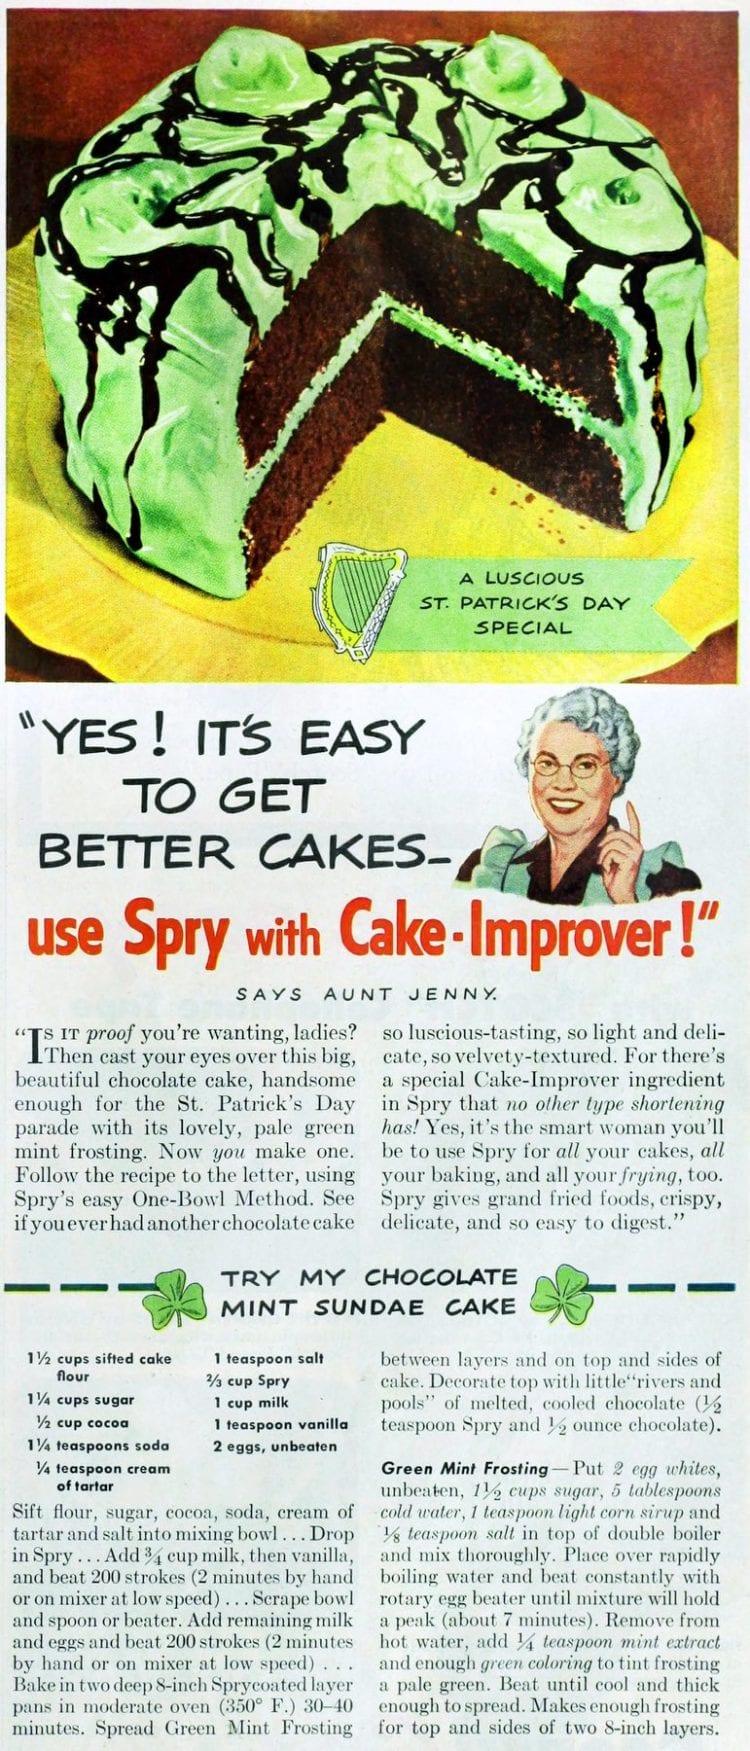 How to make an old-fashioned chocolate mint sundae cake - retro recipe